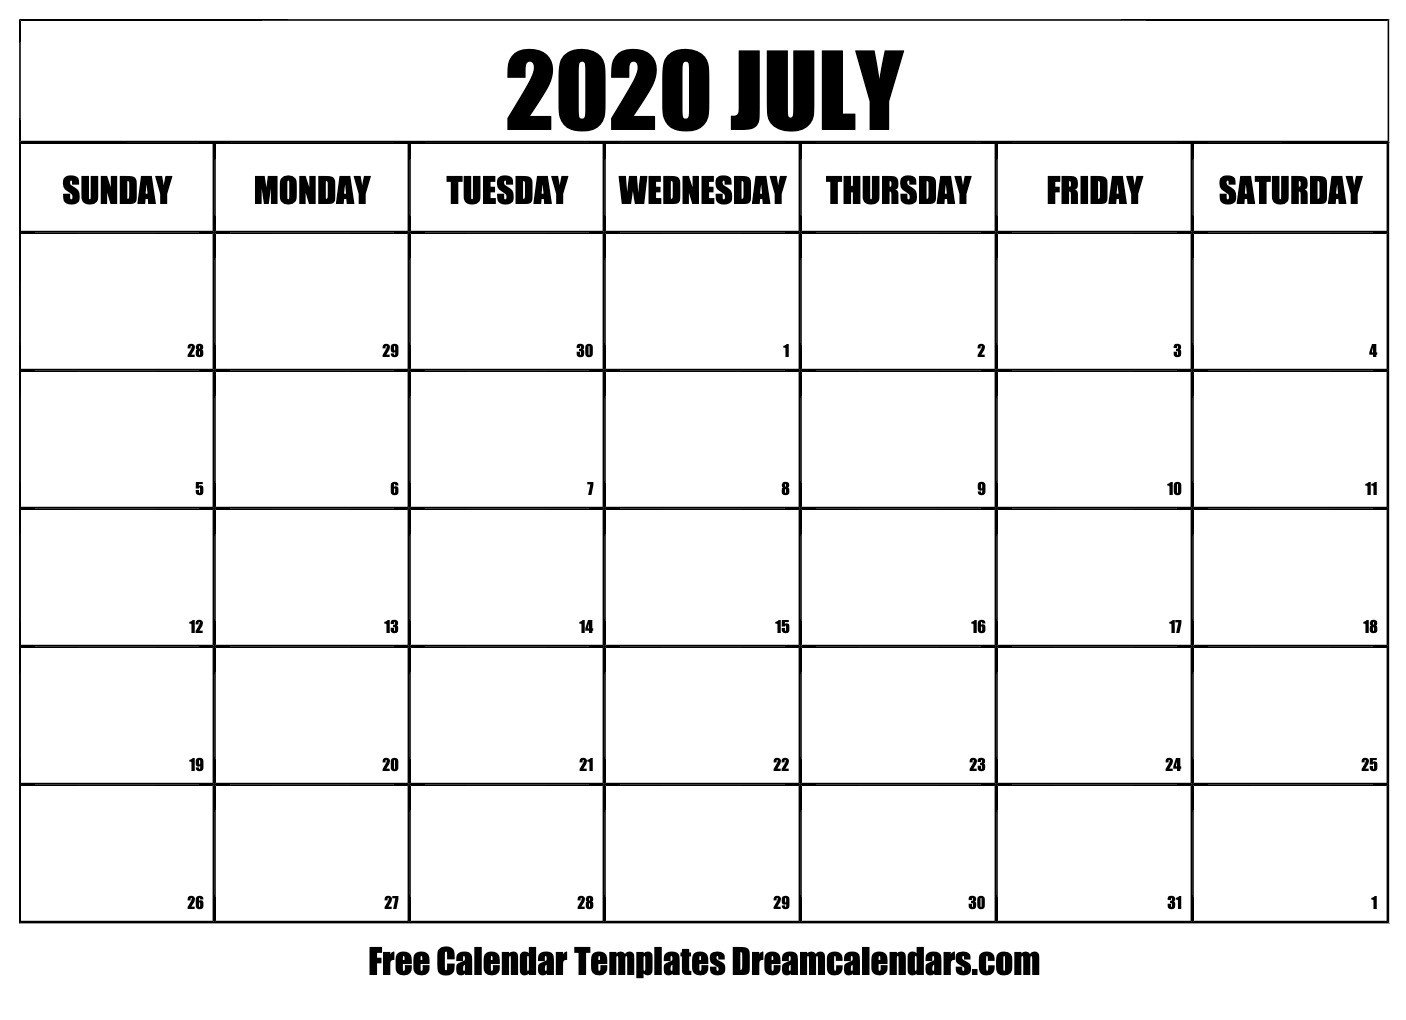 2020 Free Monthly Printable Calendar Monday Thru Friday Free Printable Calendars Monday Friday